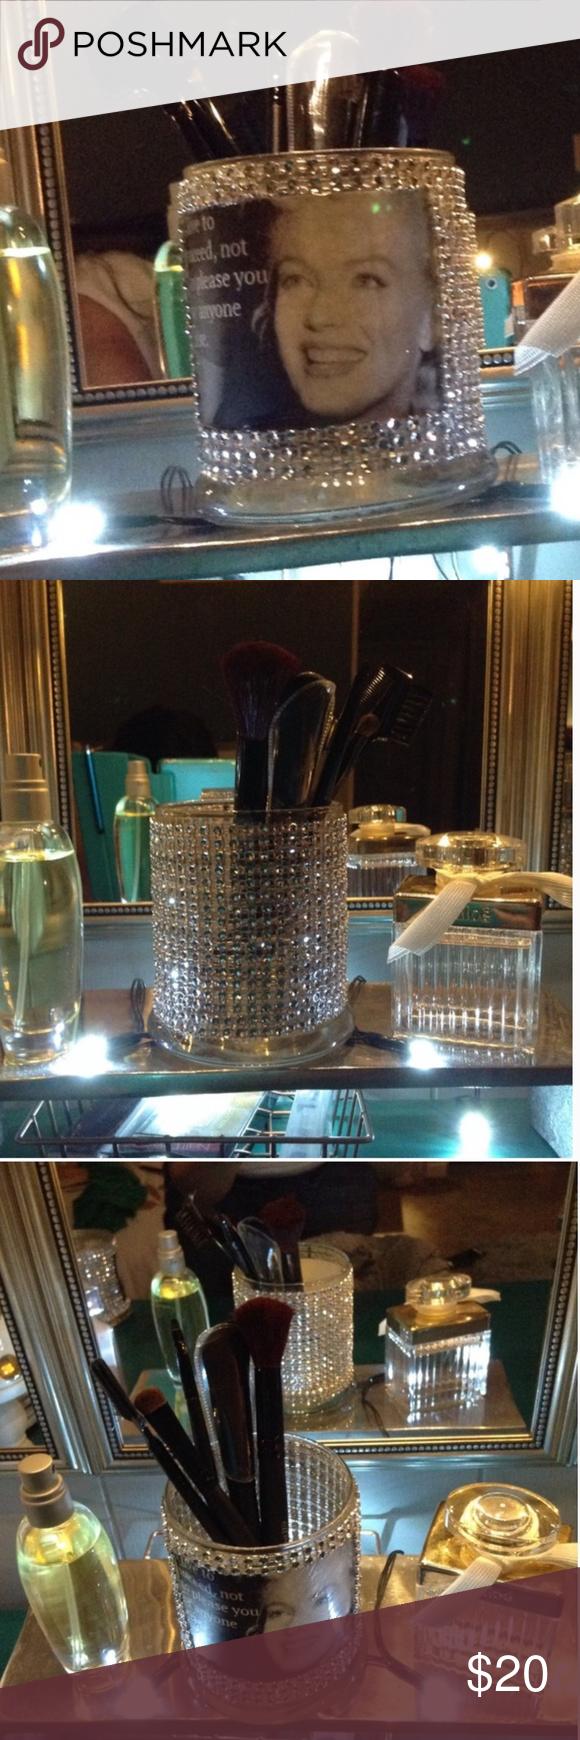 Marilyn Monroe Glam Brush Holder Organize your makeup